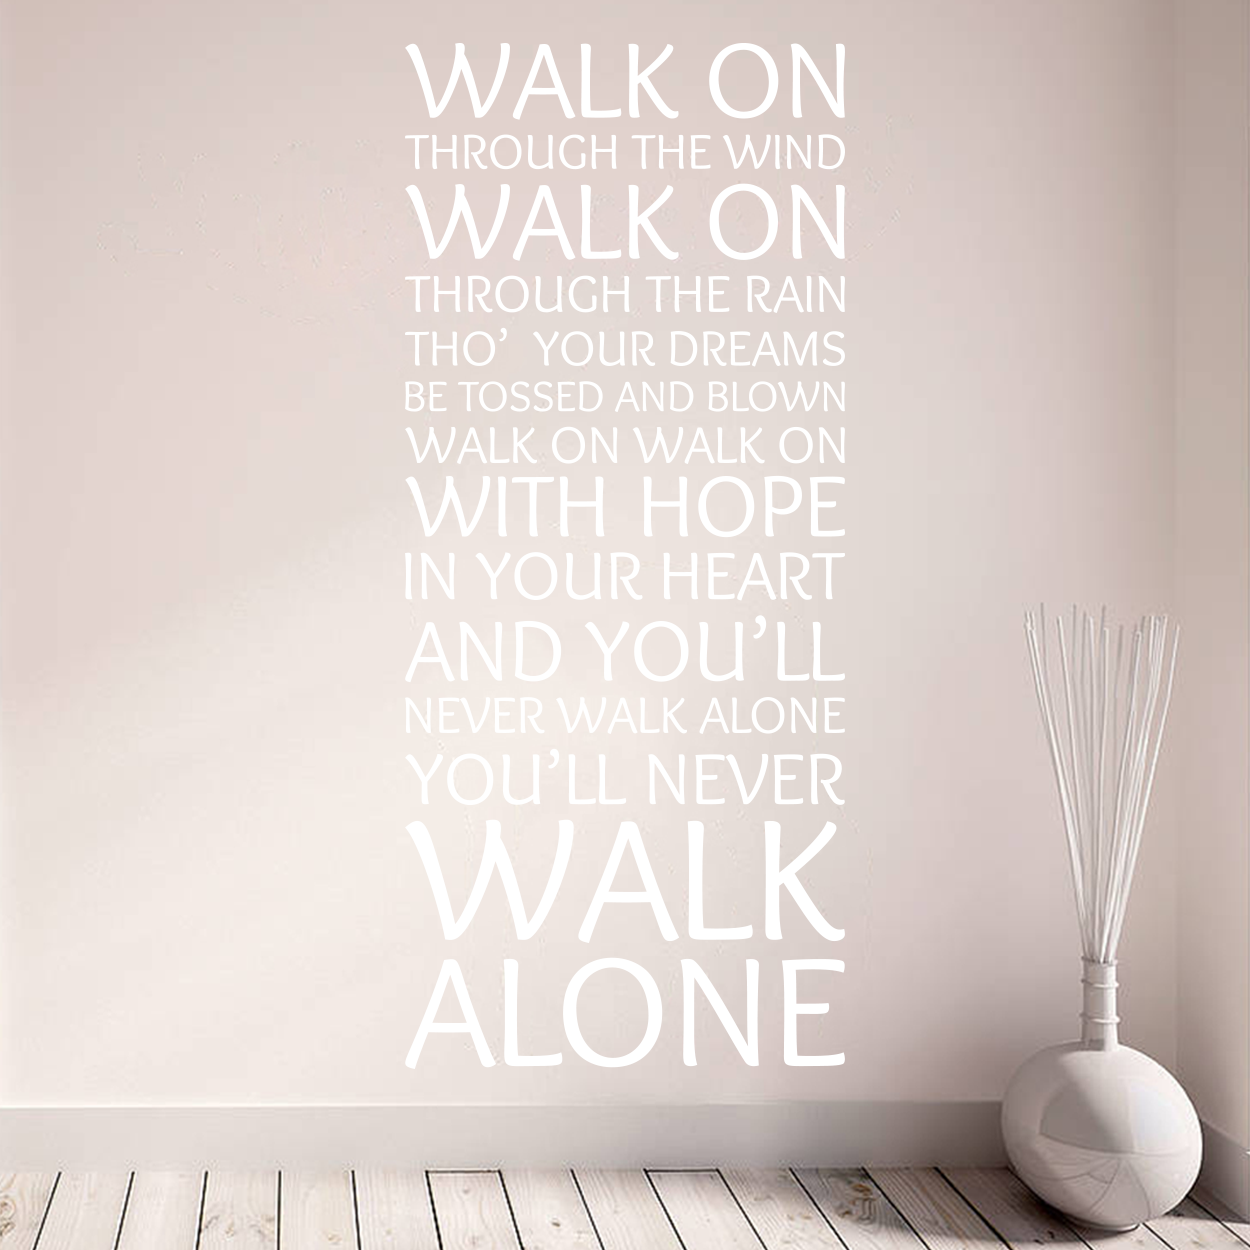 liverpool never walk alone wallsticker fra 169 kr jual wall sticker liverpool wallsticker surabaya tokopedia